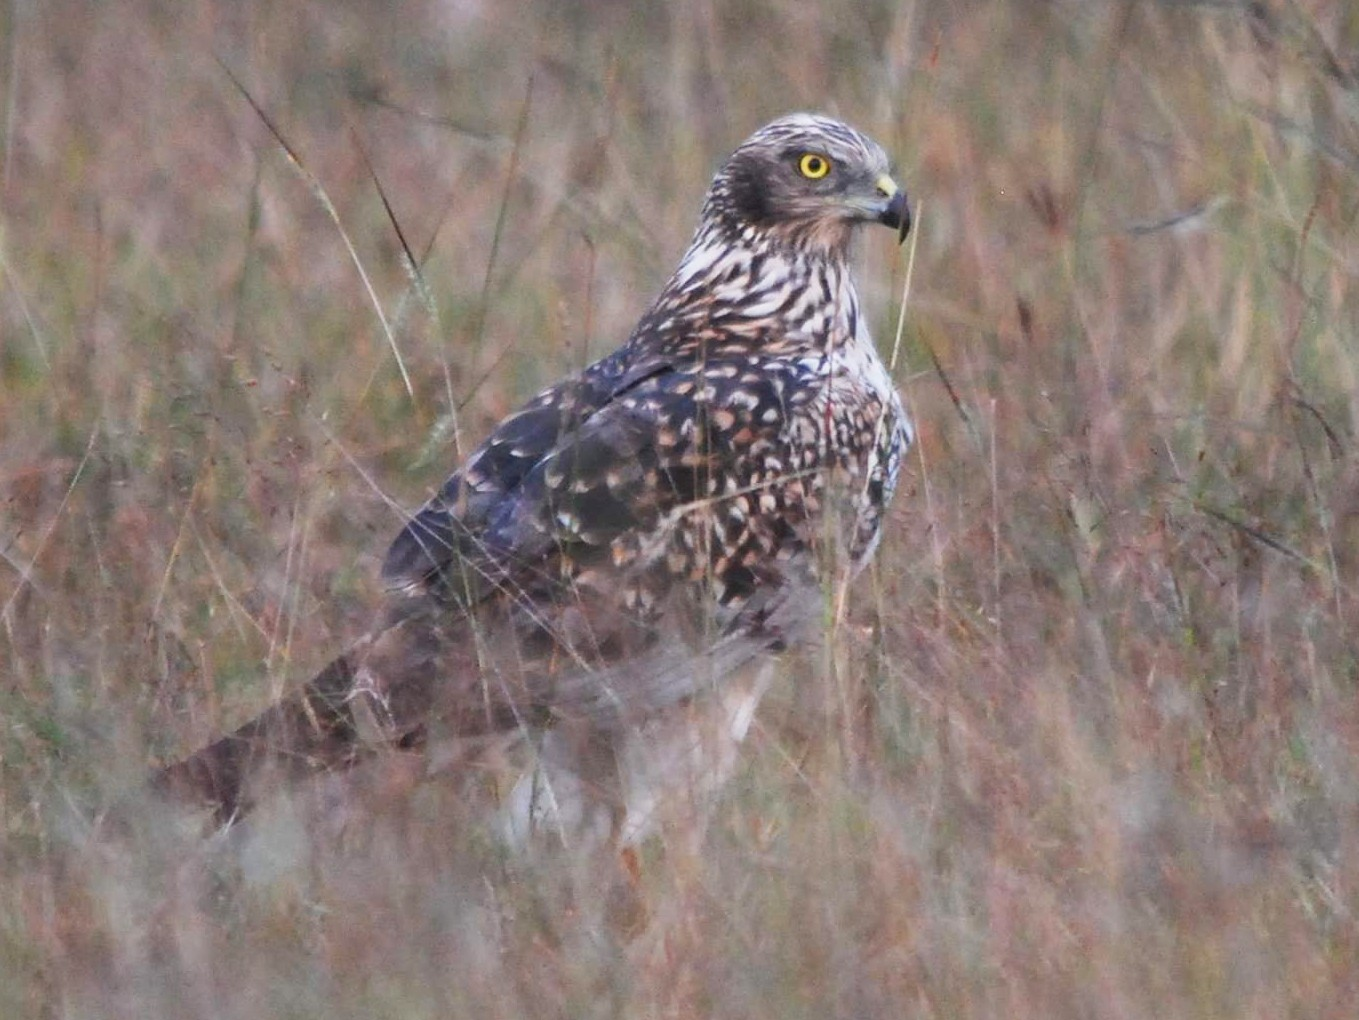 Eastern Marsh-Harrier - Gnanaskandan Kesavabharathi